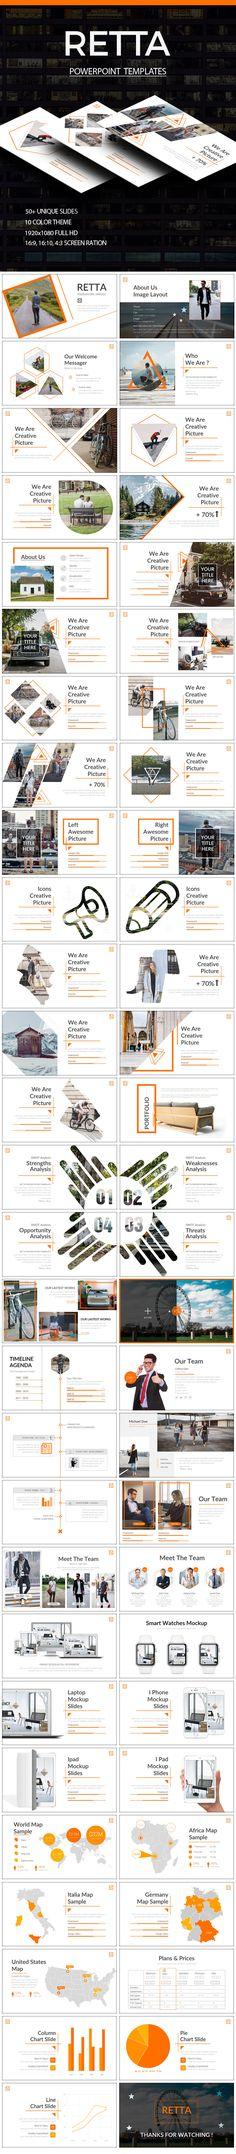 RETTA Powerpoint Template (PowerPoint Templates)